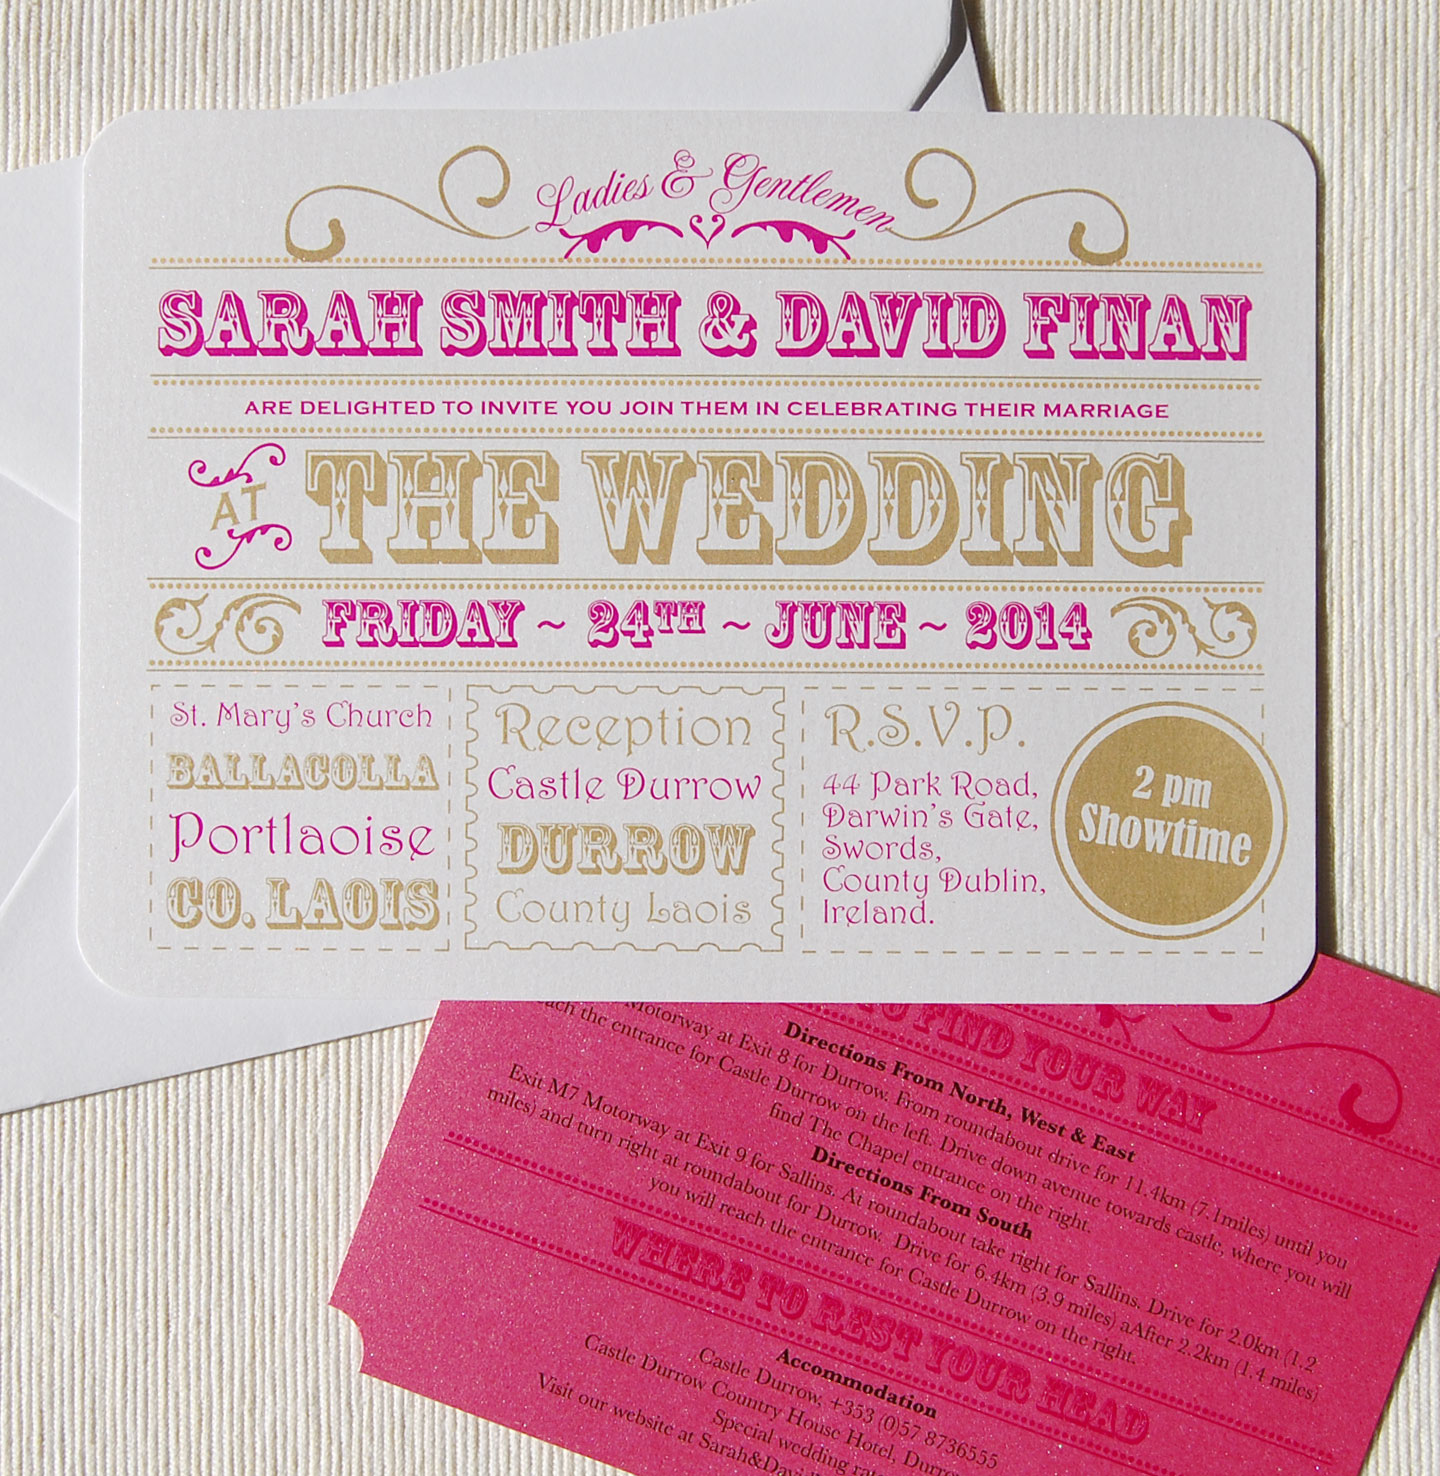 circus style wedding invitations - 28 images - vintage wedding ...